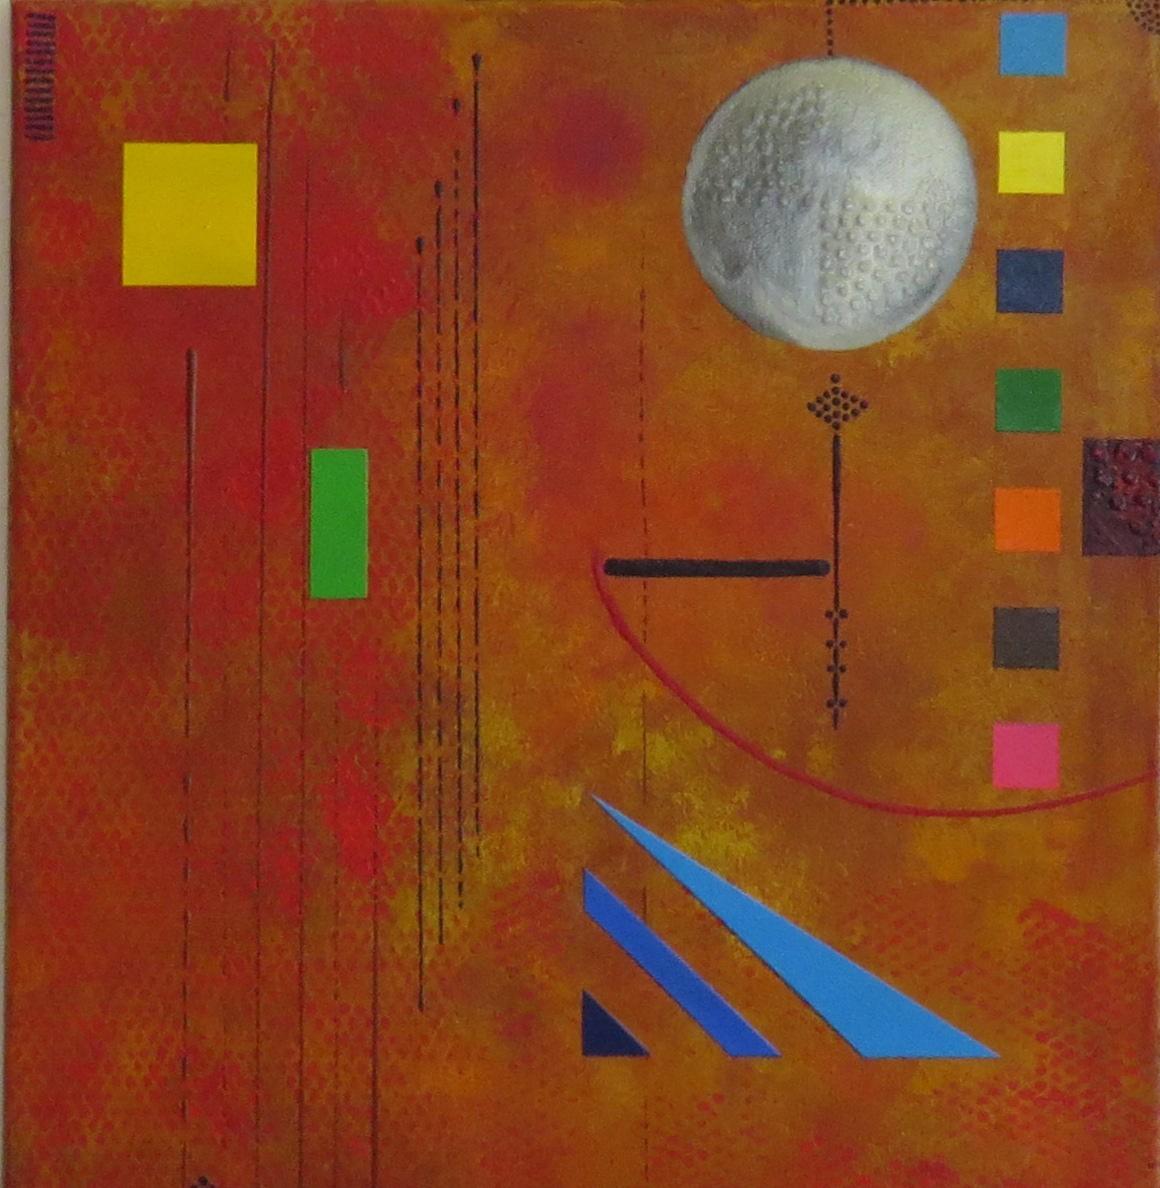 sigma - zoom2 - DALUZ GALEGO - peinture abstraite